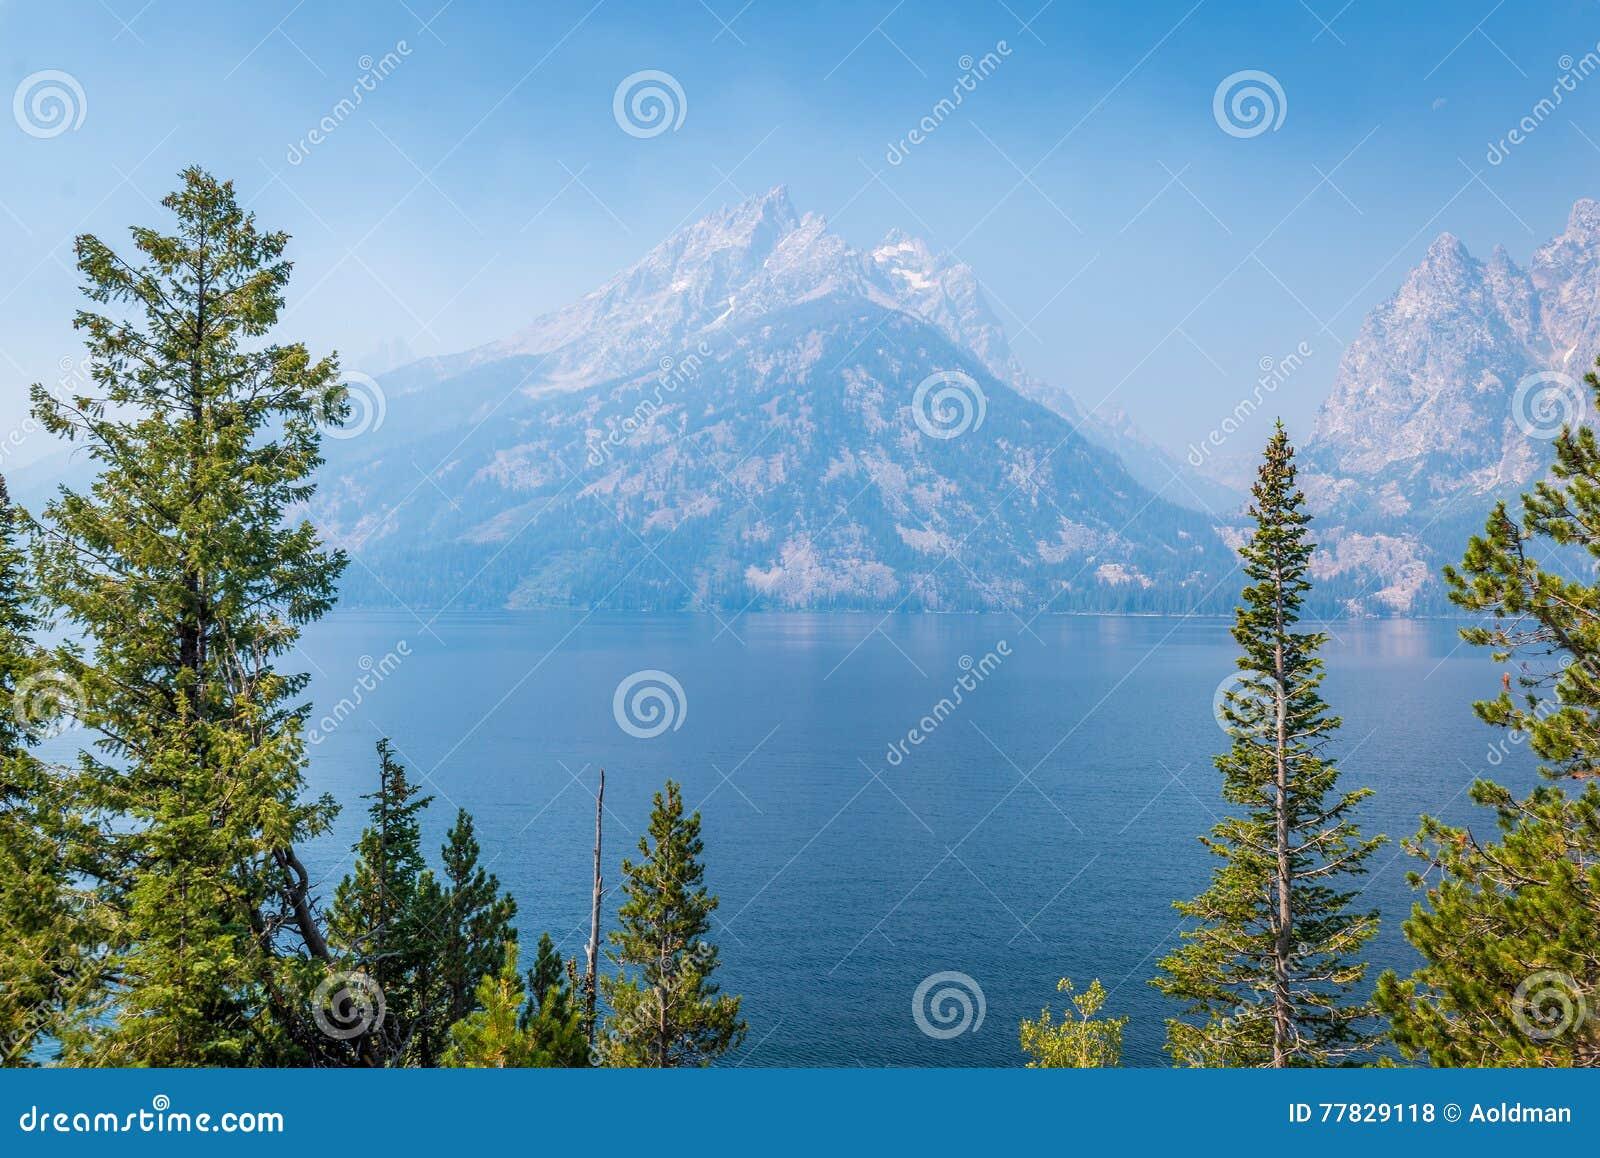 Jenny Lake in Grand Tetons